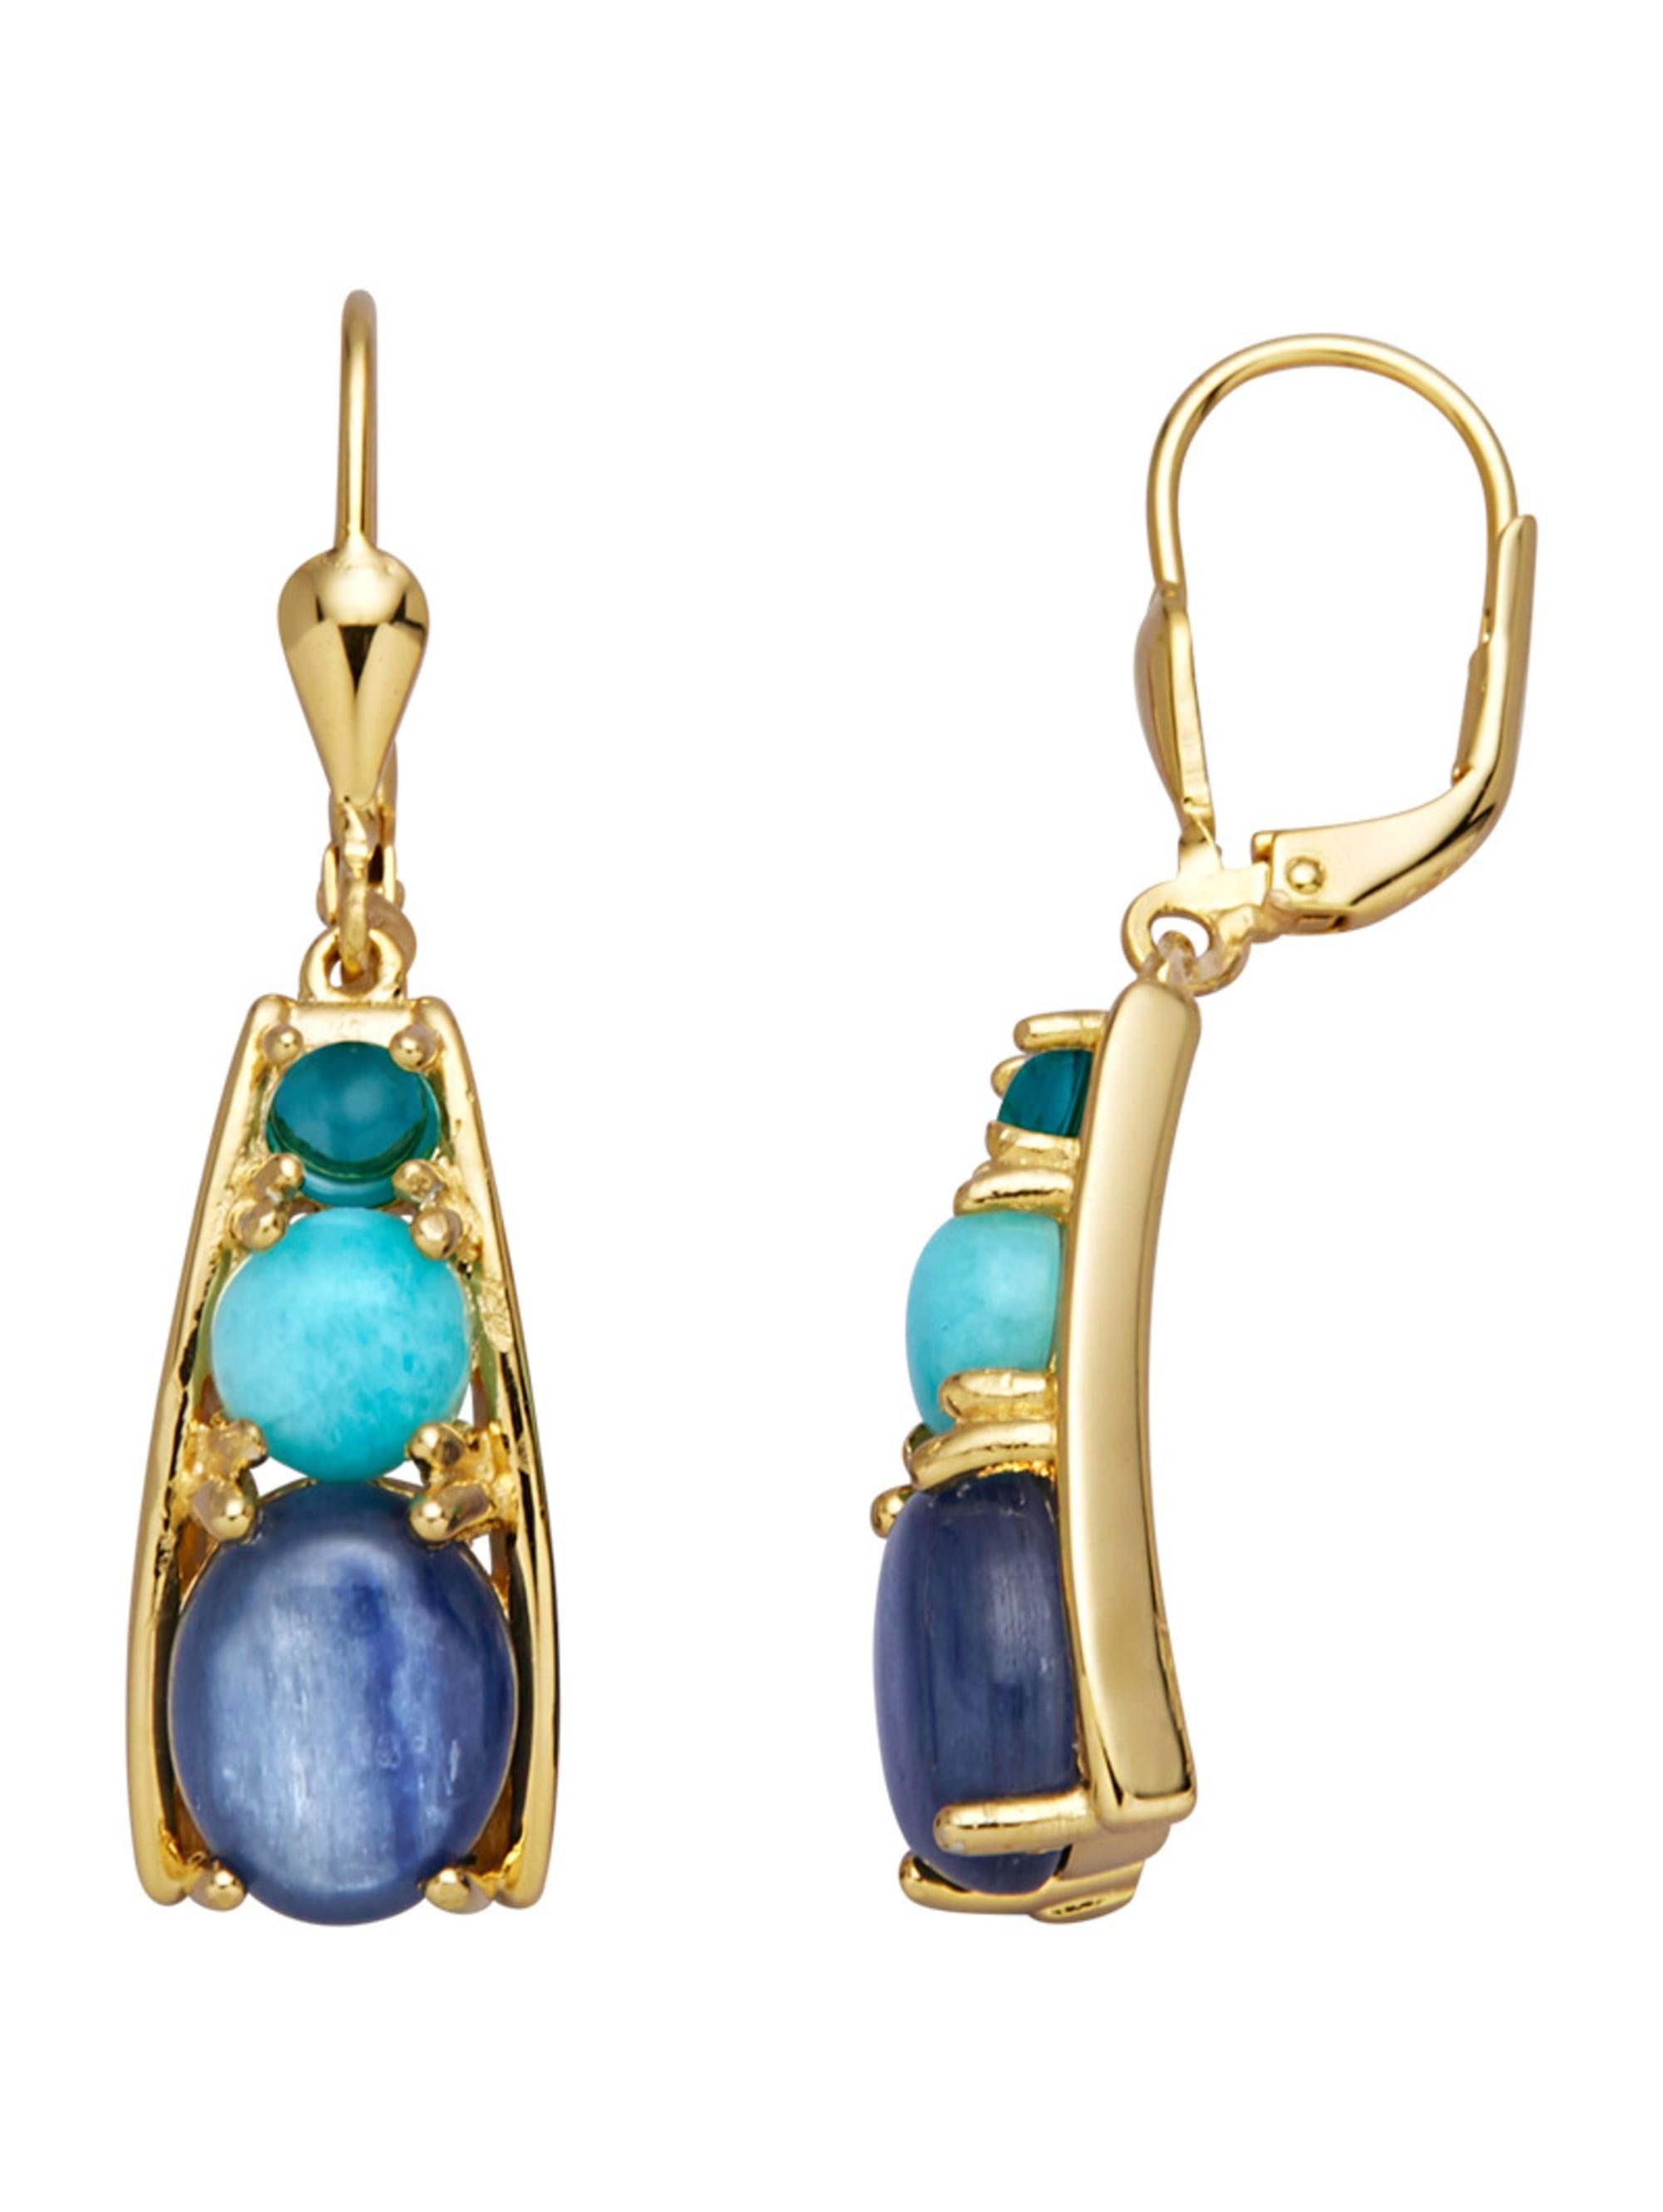 Ohrringe mit Kyaniten, Amazoniten und Blautopasen yRoe0